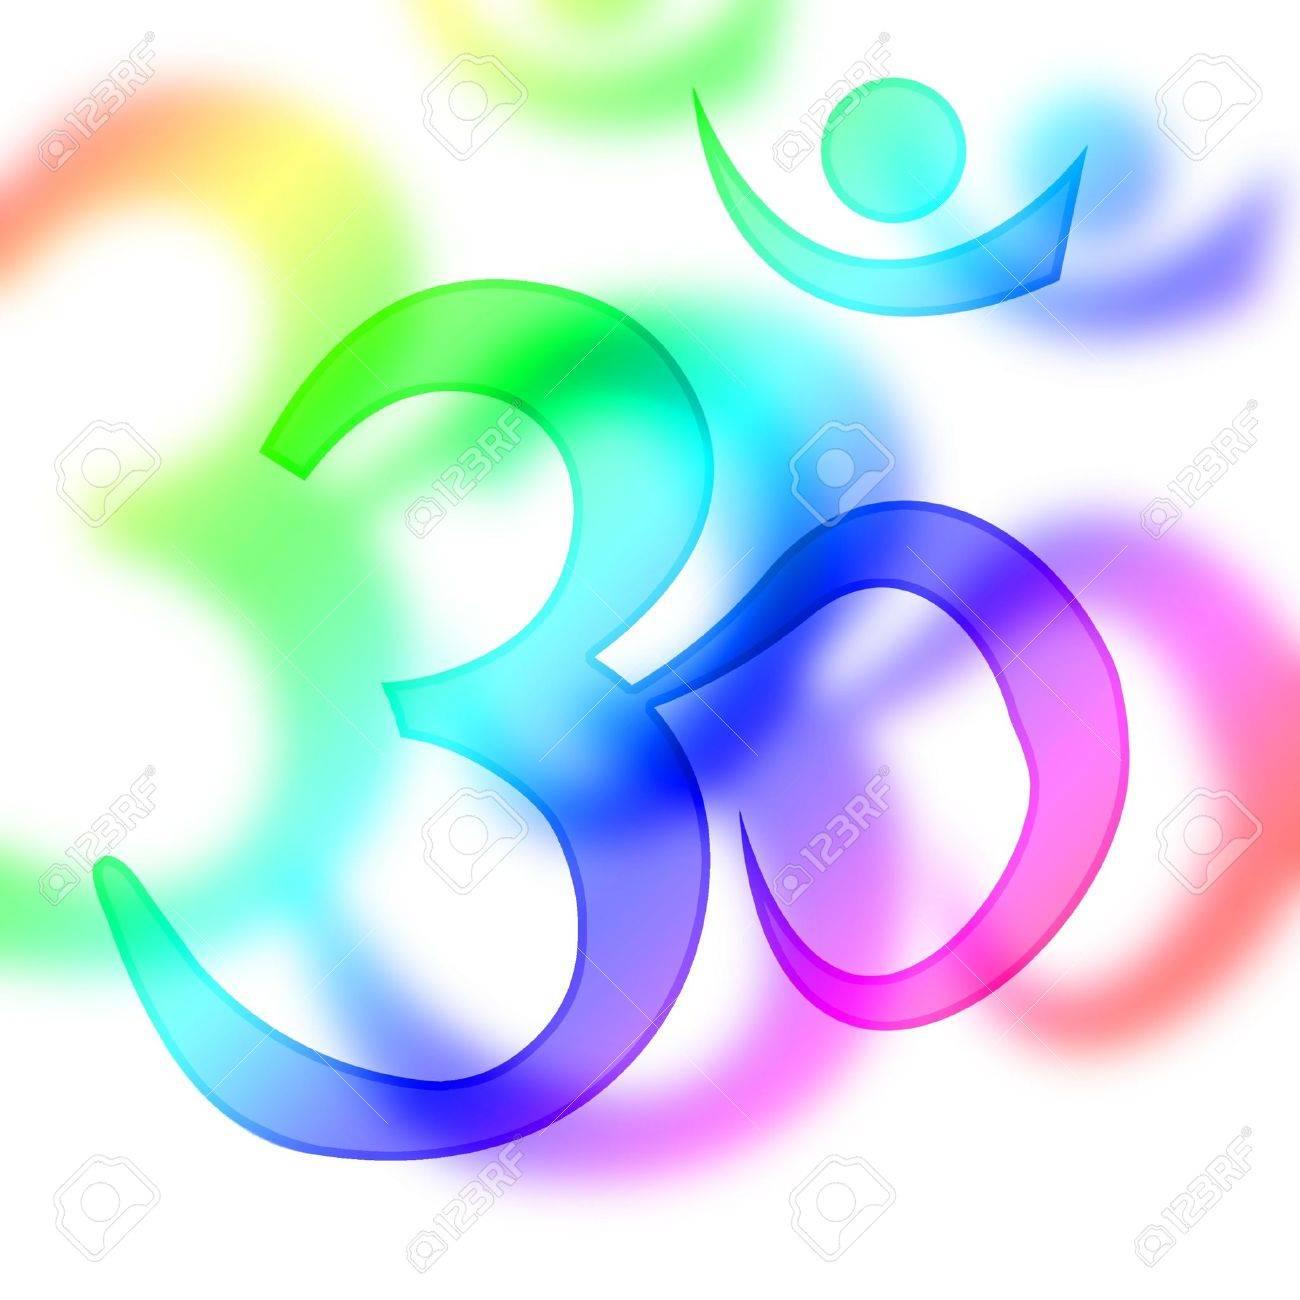 om aum symbol on a white background Stock Photo - 5659559